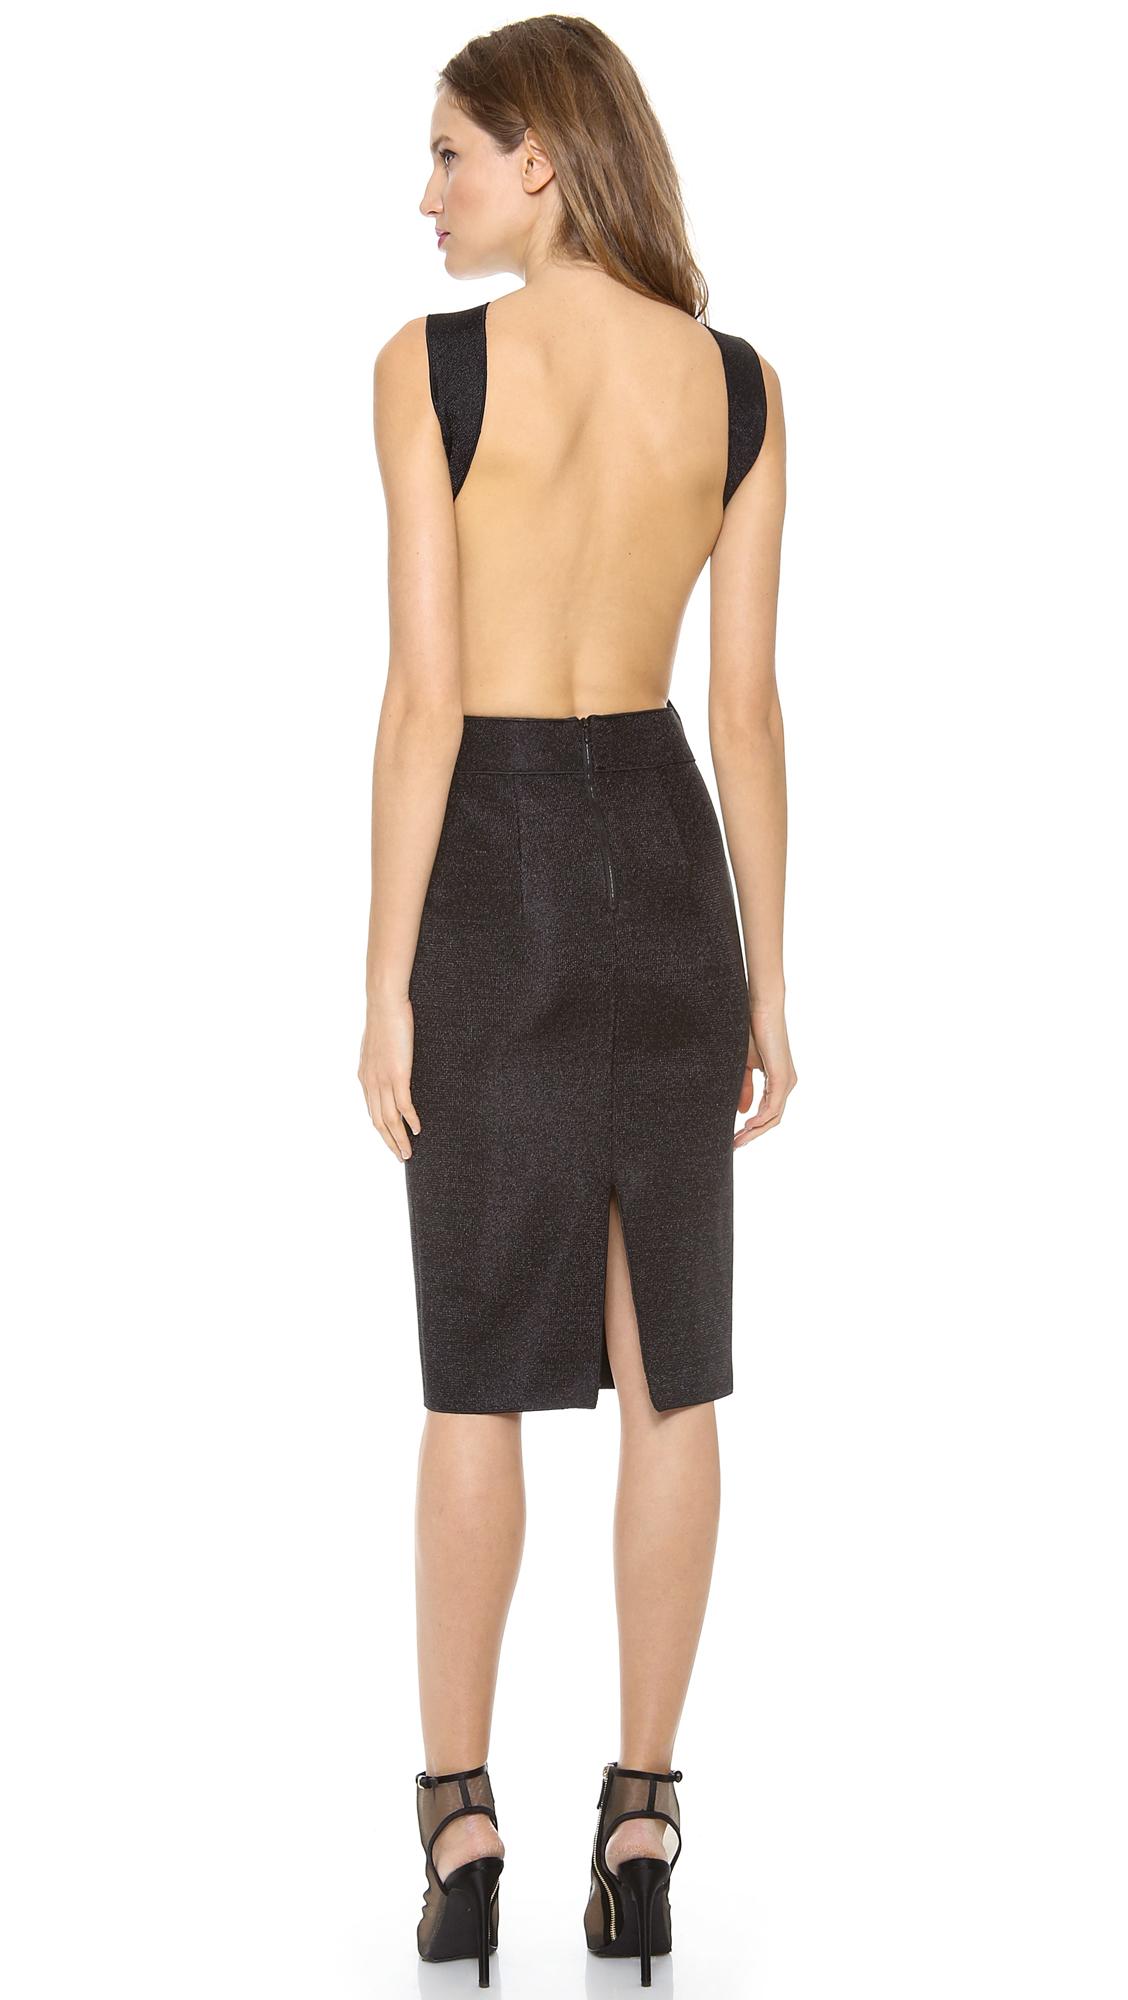 Dion Lee Vertigo Backless Knit Dress In Black Lyst